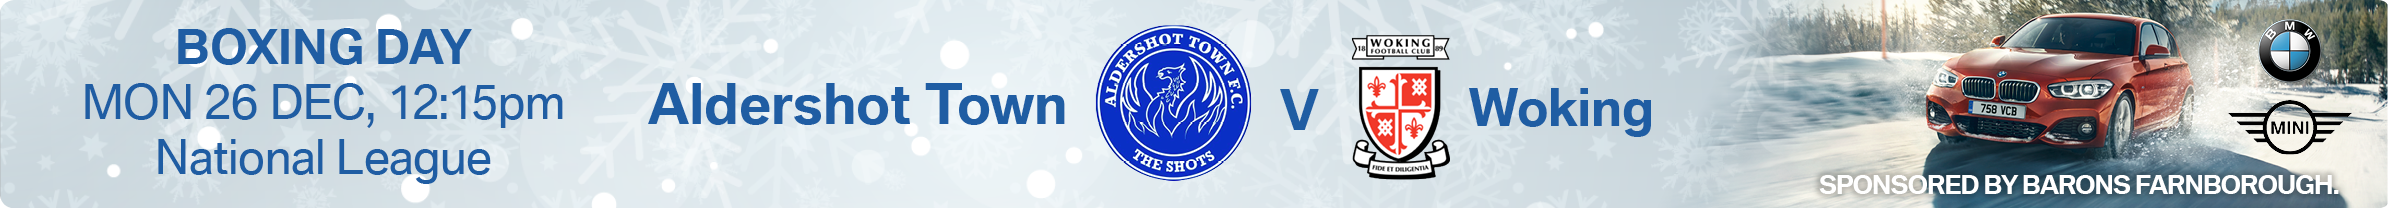 Aldershot Town F.C. vs Woking FC - Sponsored by Barons Farnborough